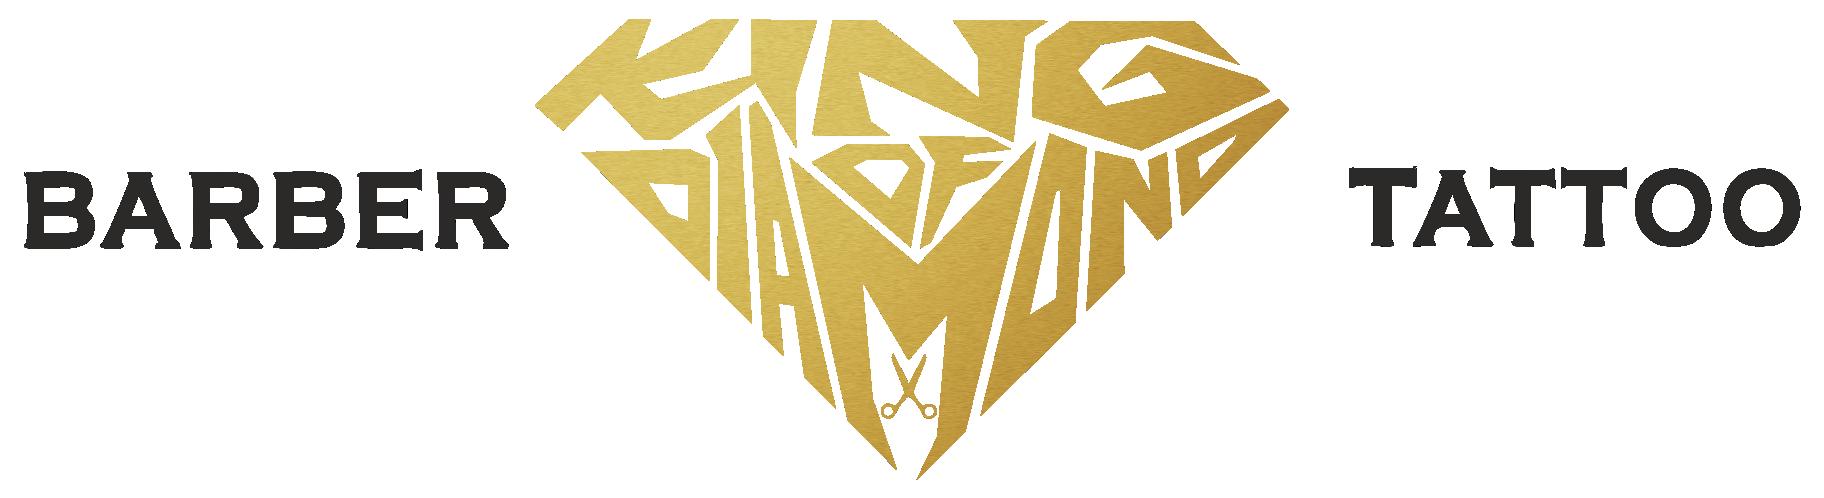 Barber Tatto King of Diamond